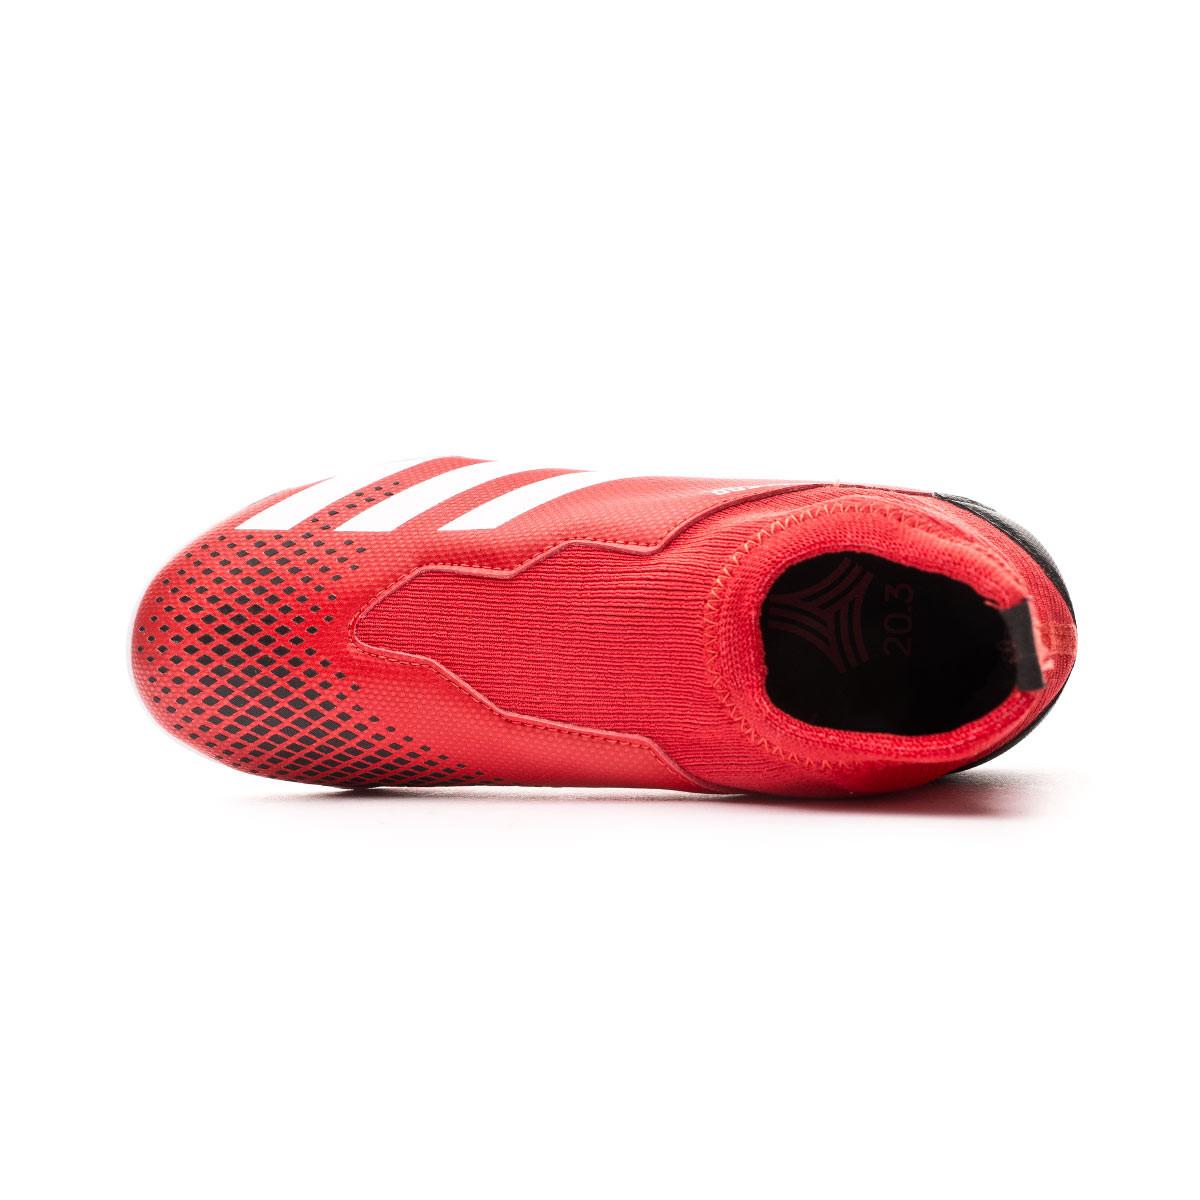 Scarpe adidas Predator 20.3 LL IN Niño